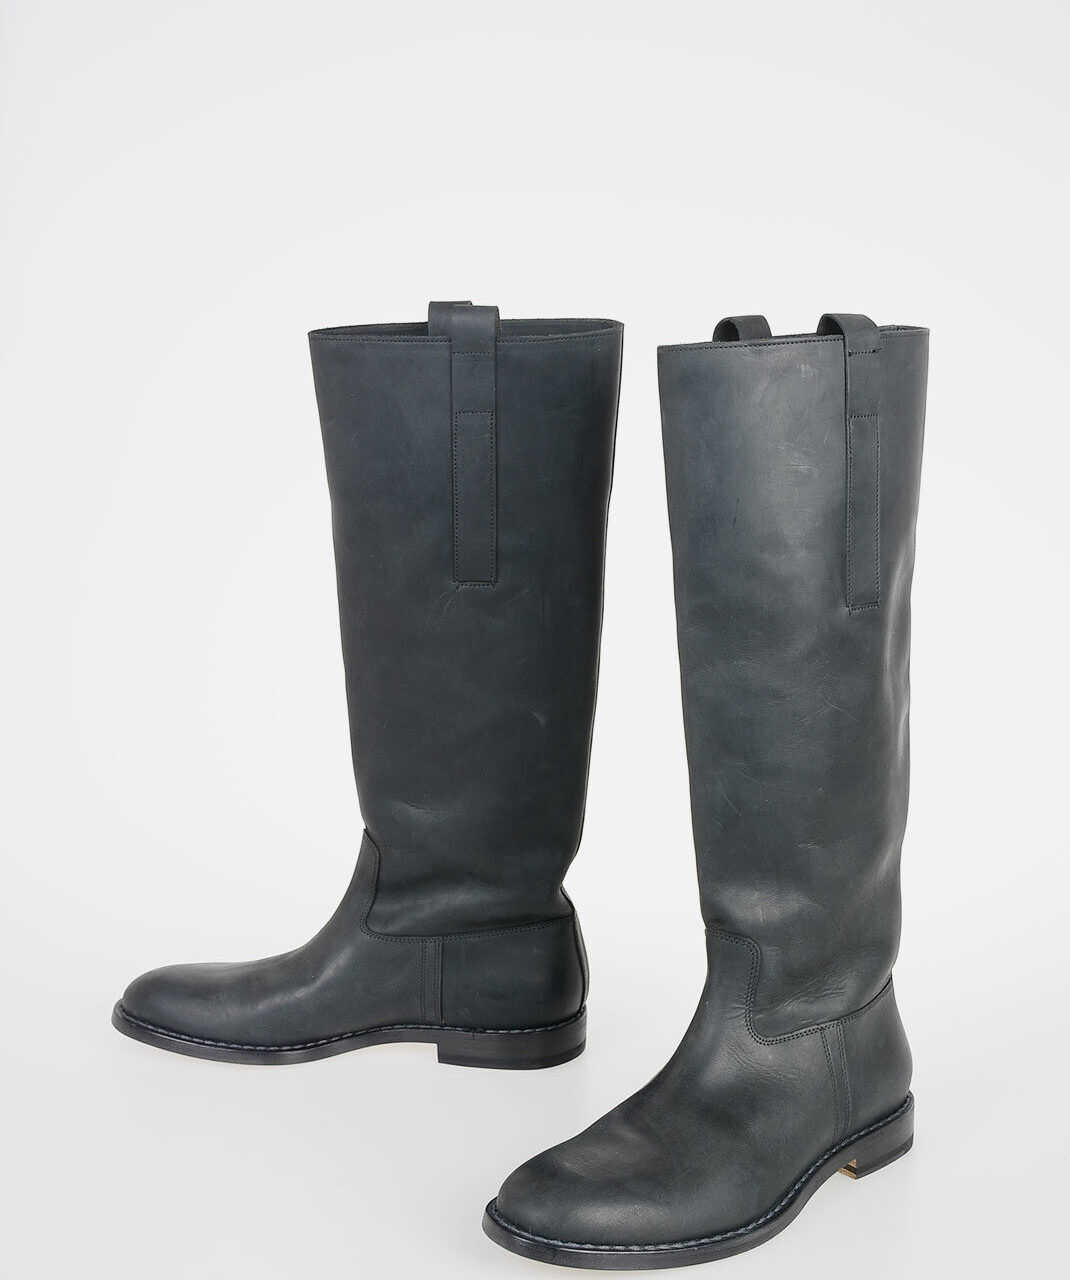 Maison Margiela MM22 Suede Leather Ankle Boots BLACK